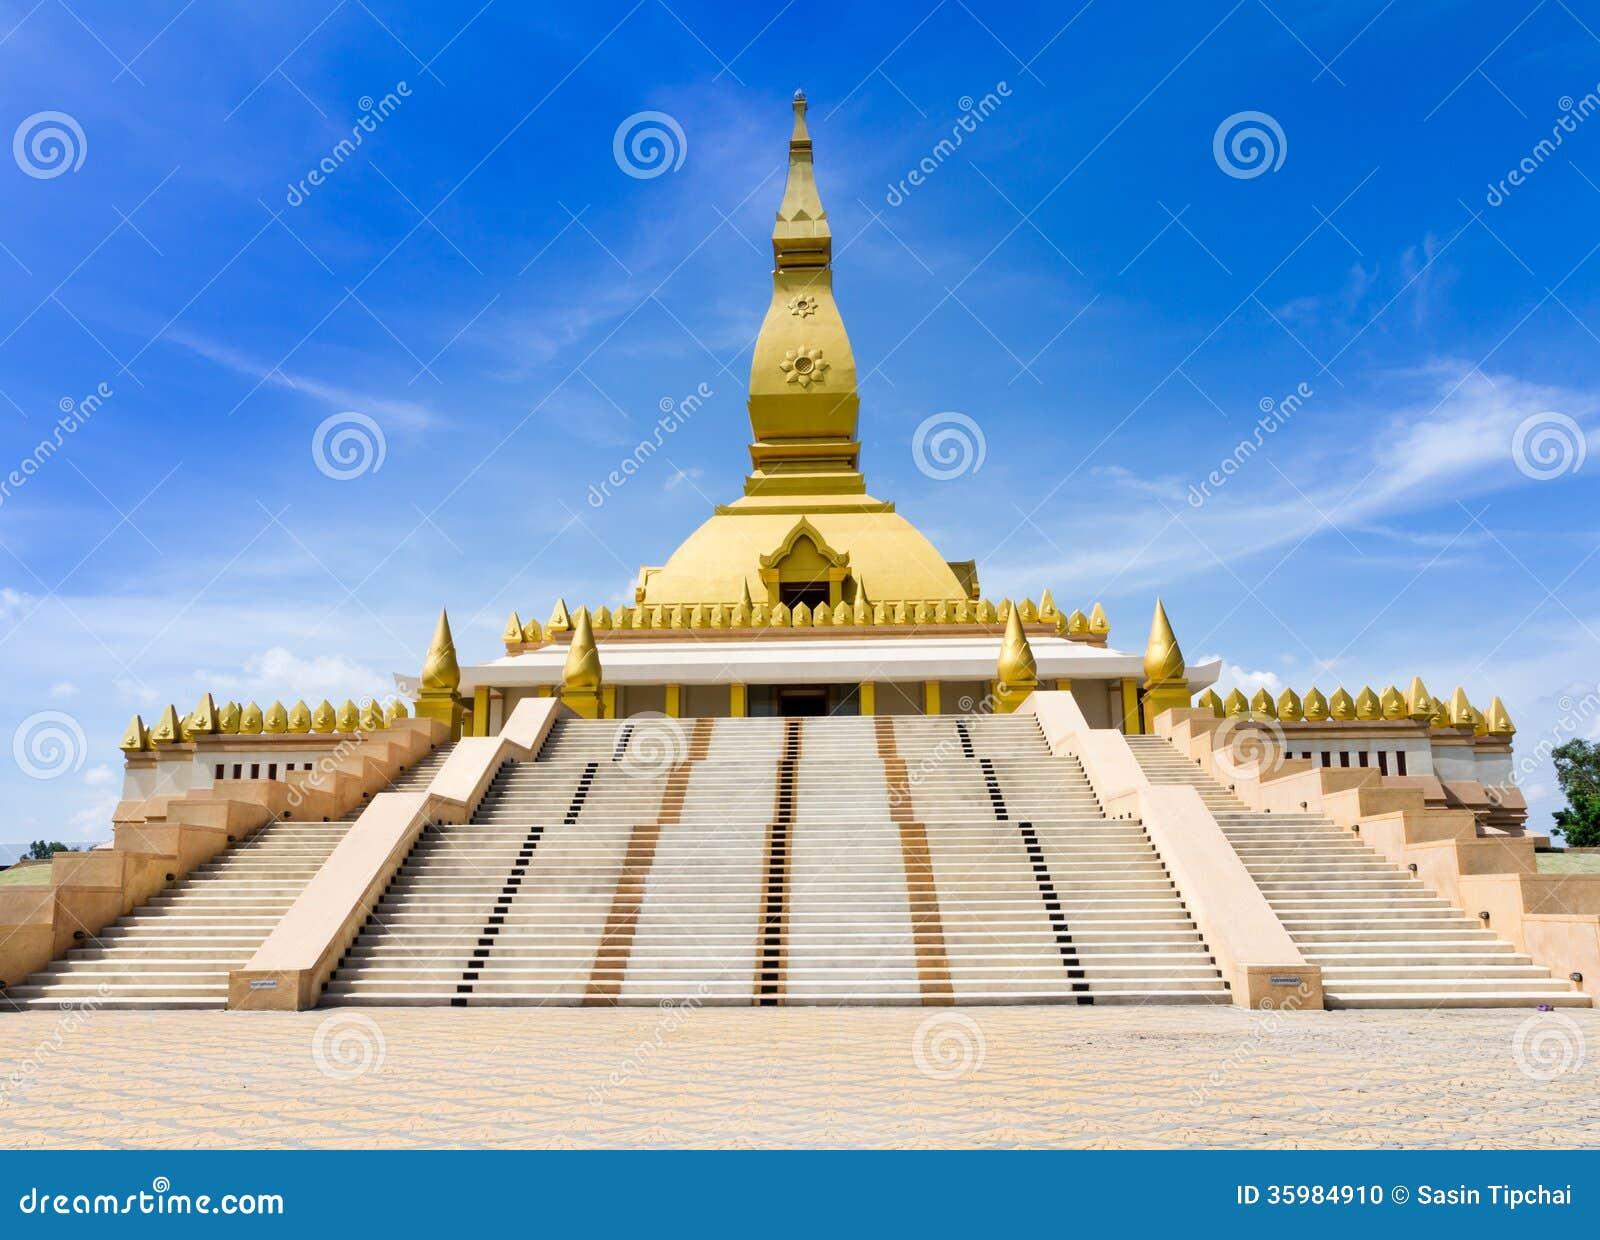 Roi Et Thailand  City new picture : Pagoda Mahabua, Roi Et, Thailand.